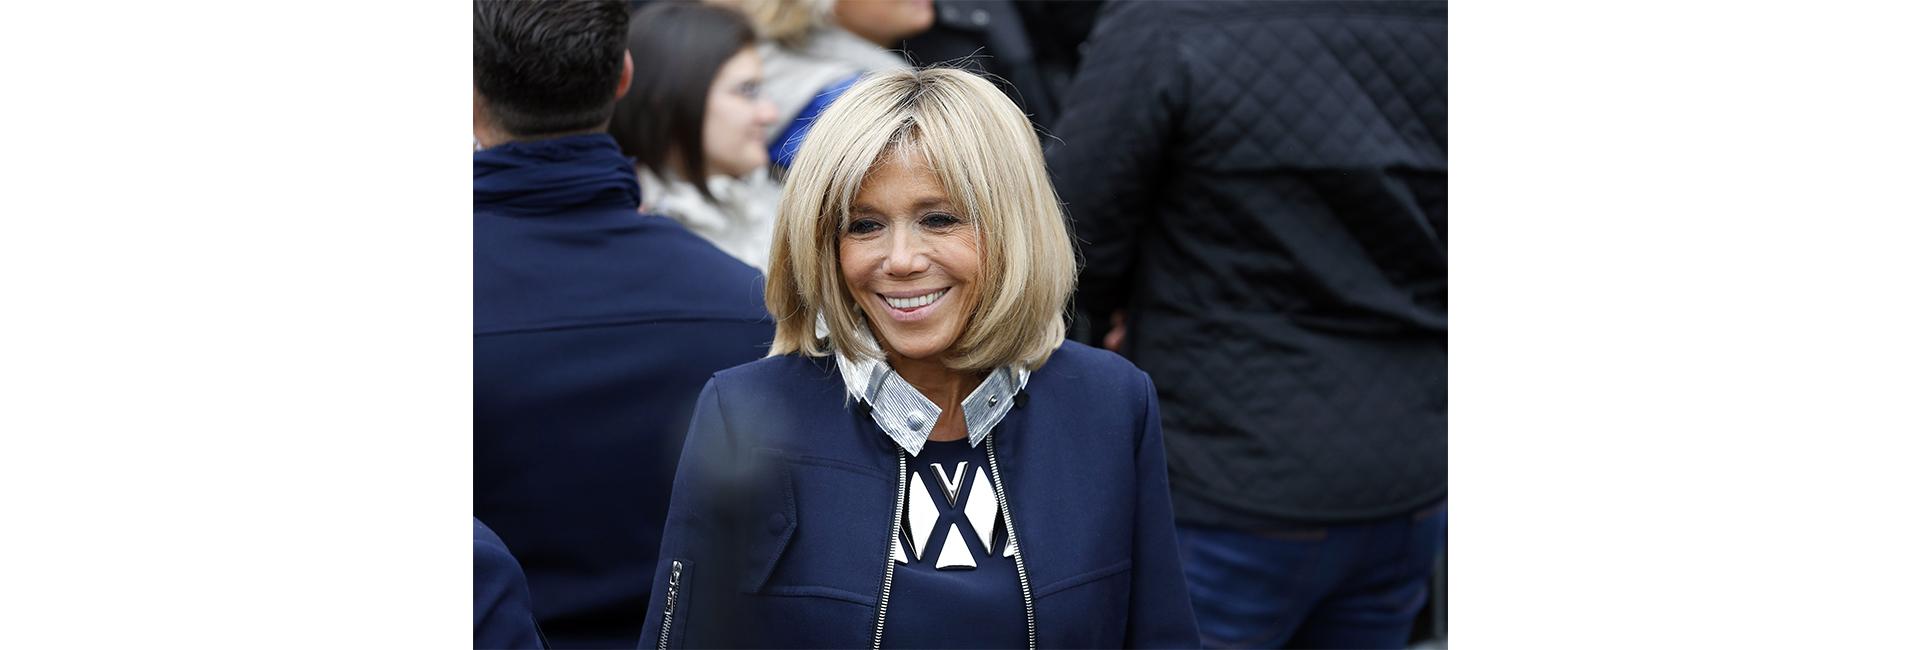 Кто такая Брижит Макрон — супруга нового президента Франции (фото 4)